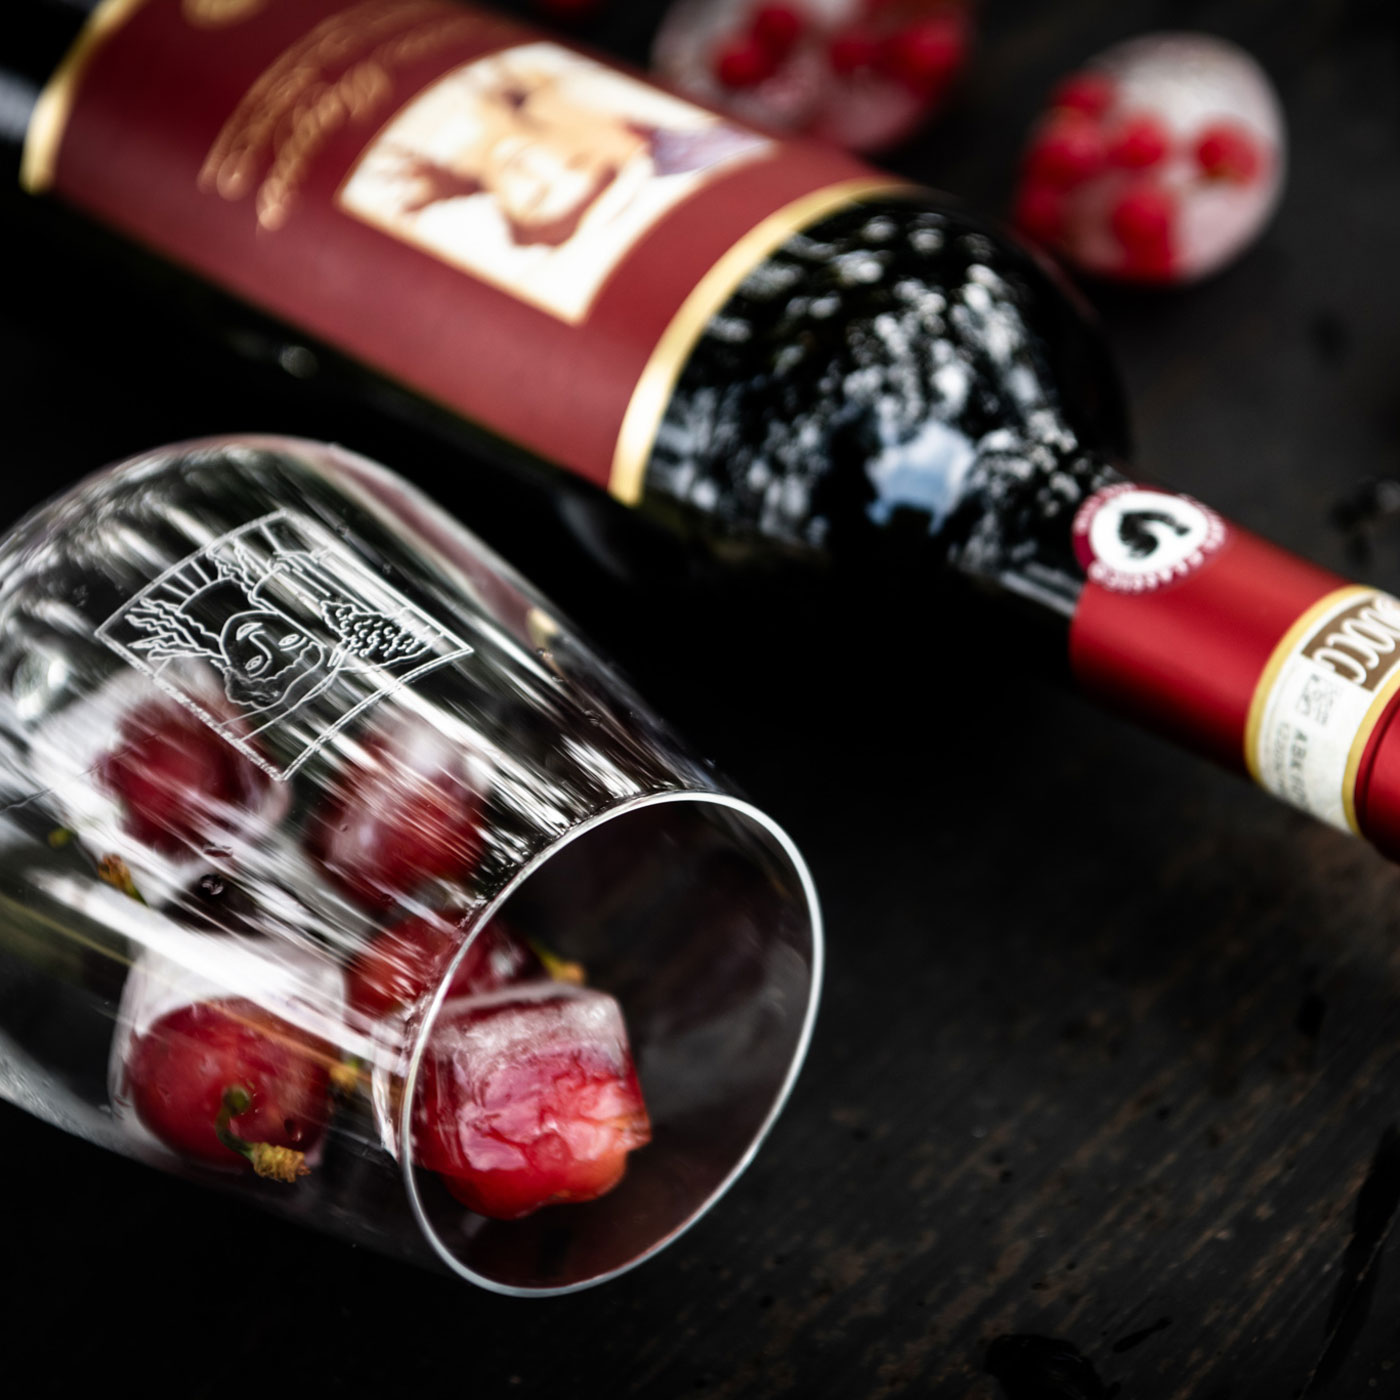 Enjoy the Chianti Classico organic red wine buy buying online or wine tasting